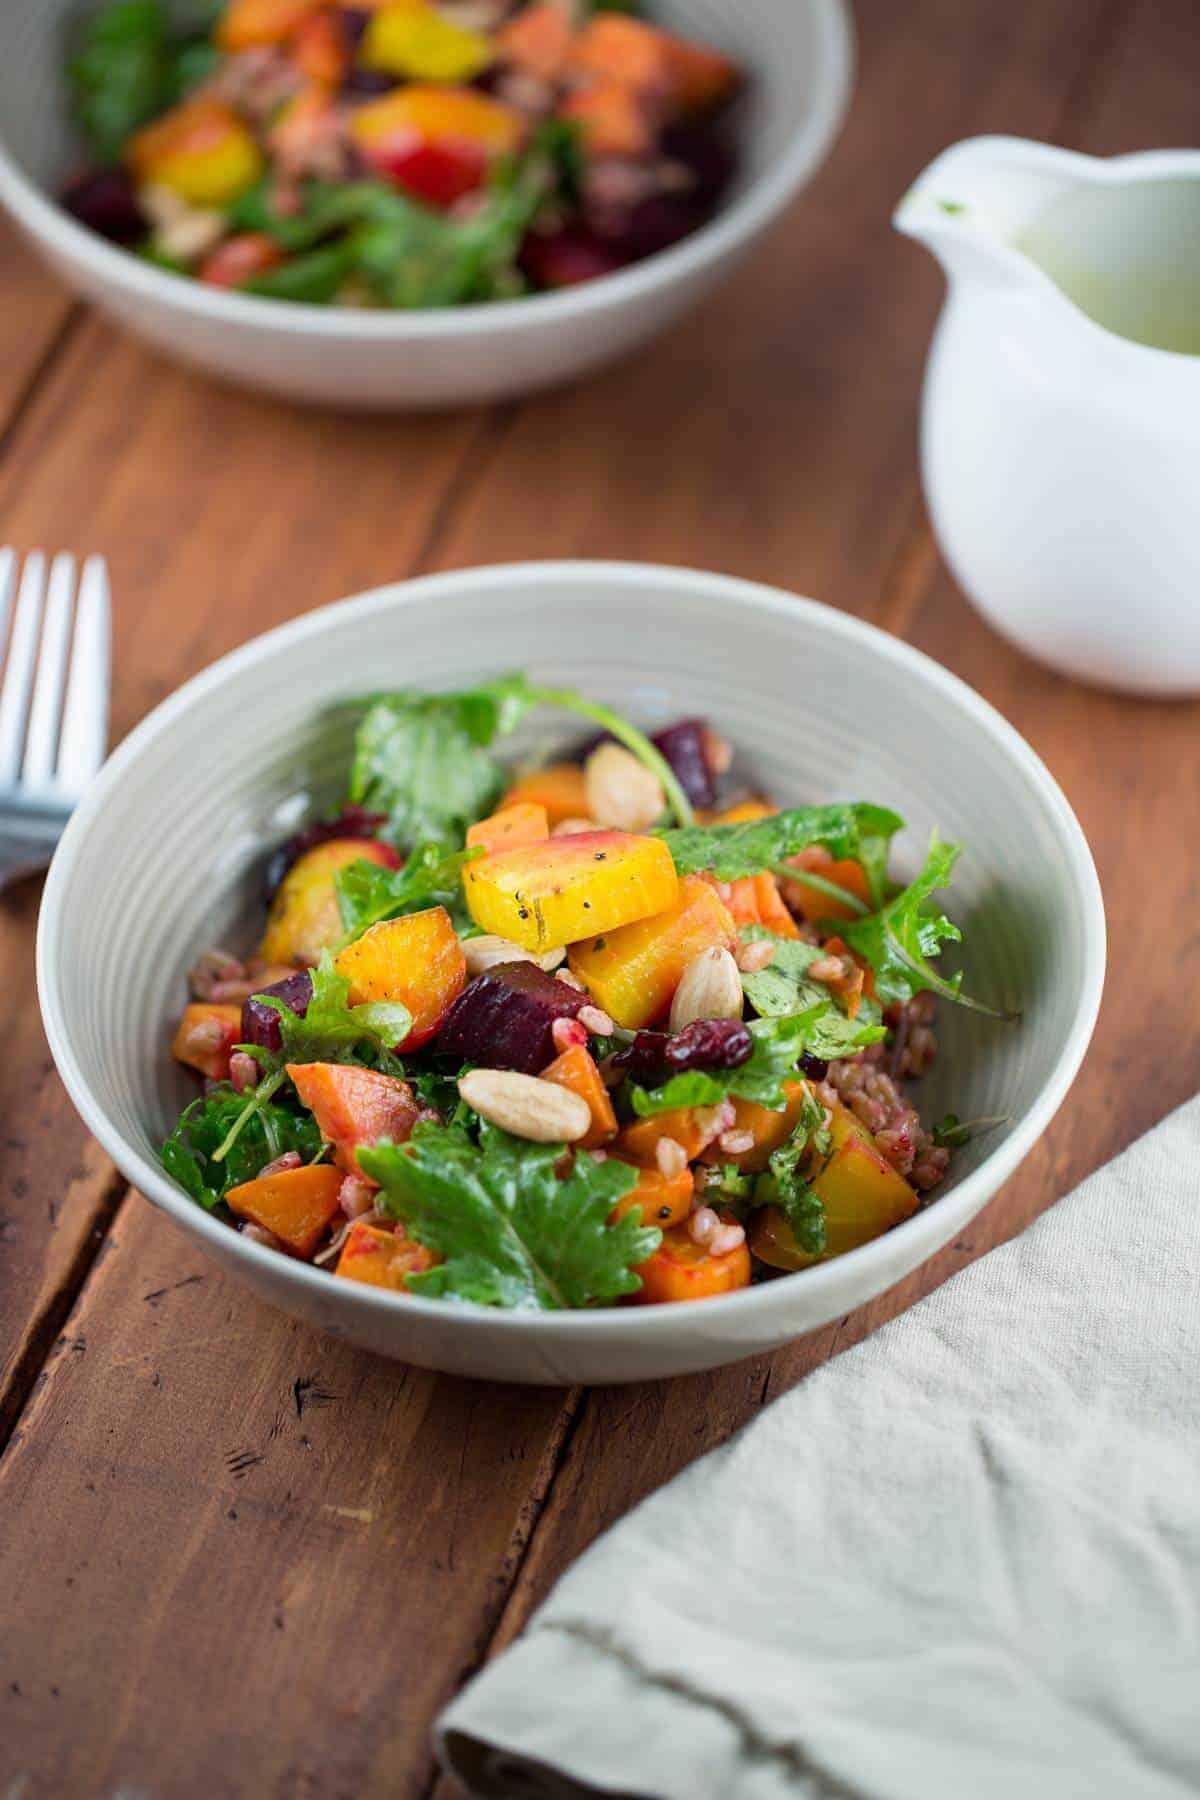 Delicious Harvest Roasted Root Vegetable Salad with Farro | jessicagavin.com #healthyrecipe